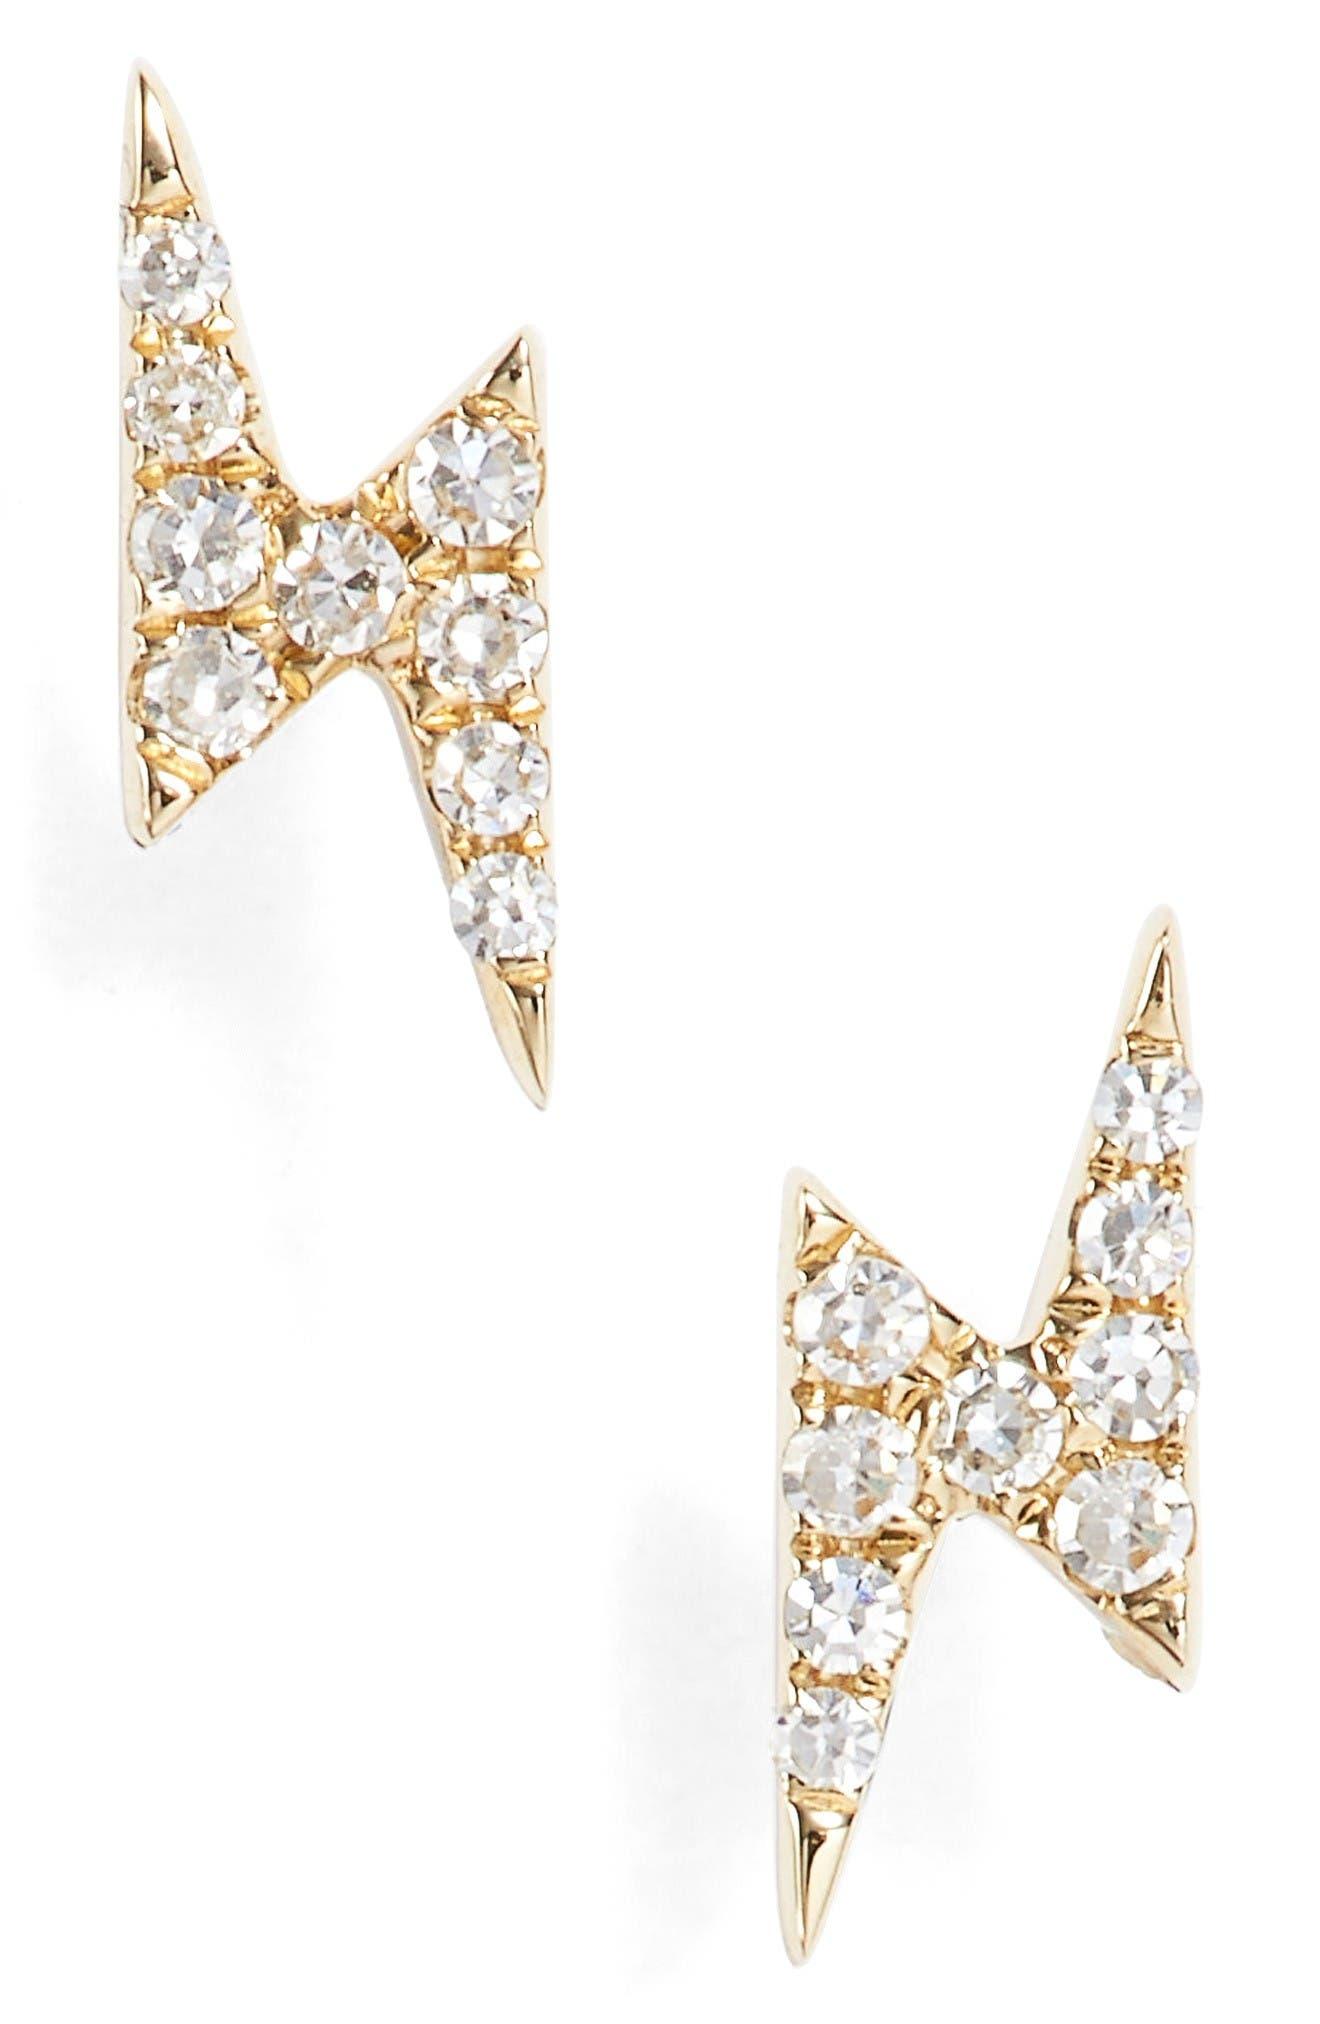 Main Image - EF COLLECTION Diamond Stud Earrings